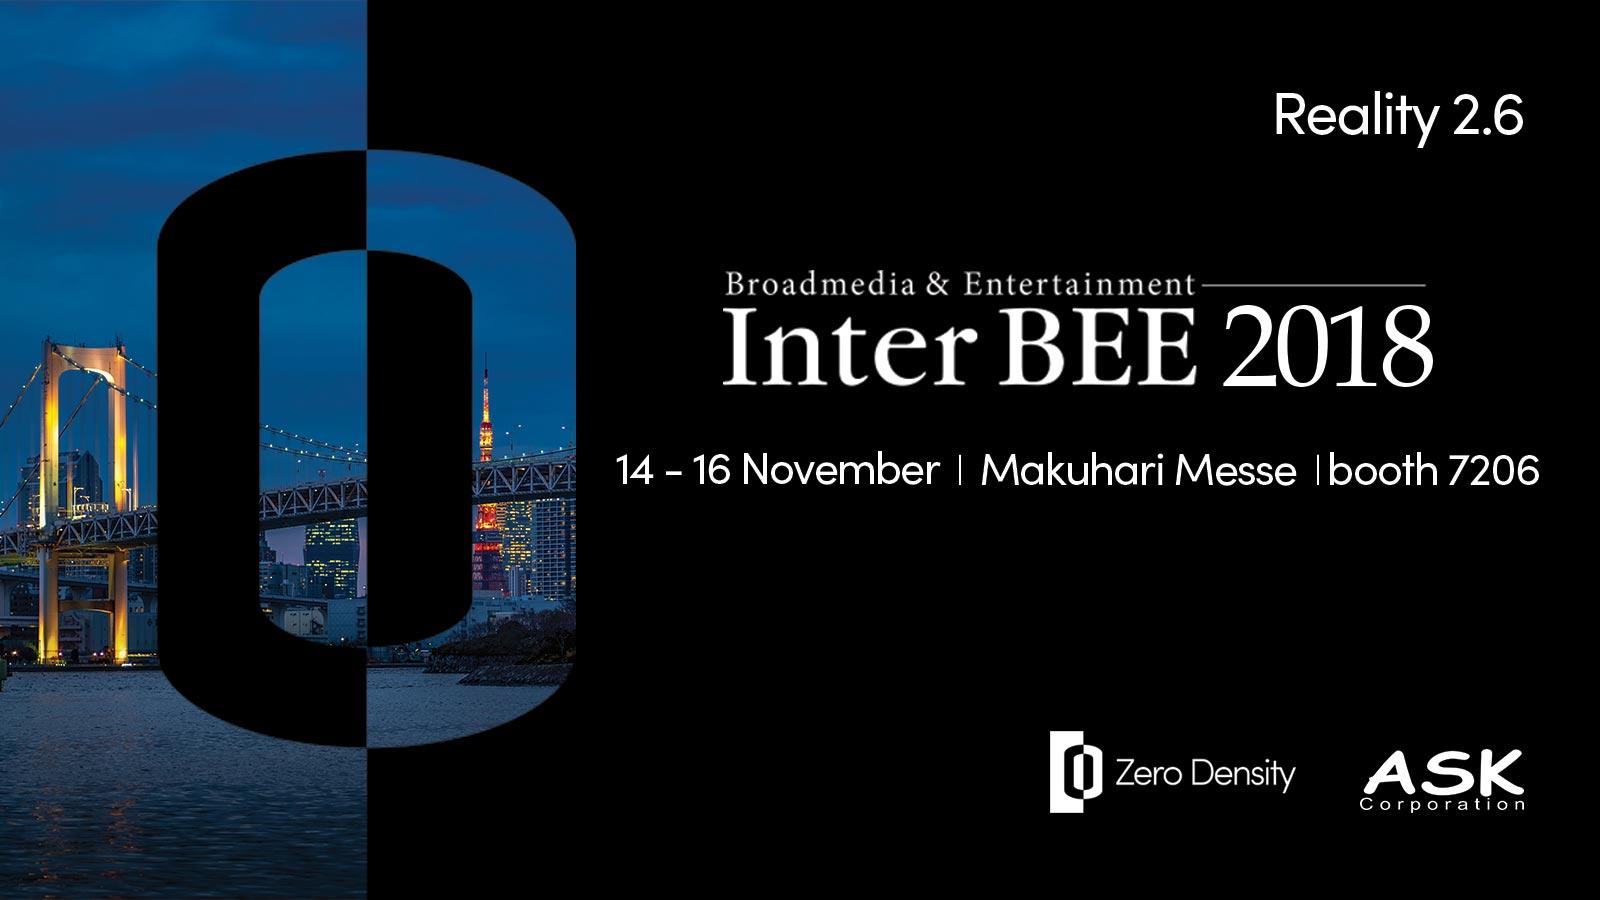 Interbee 2018